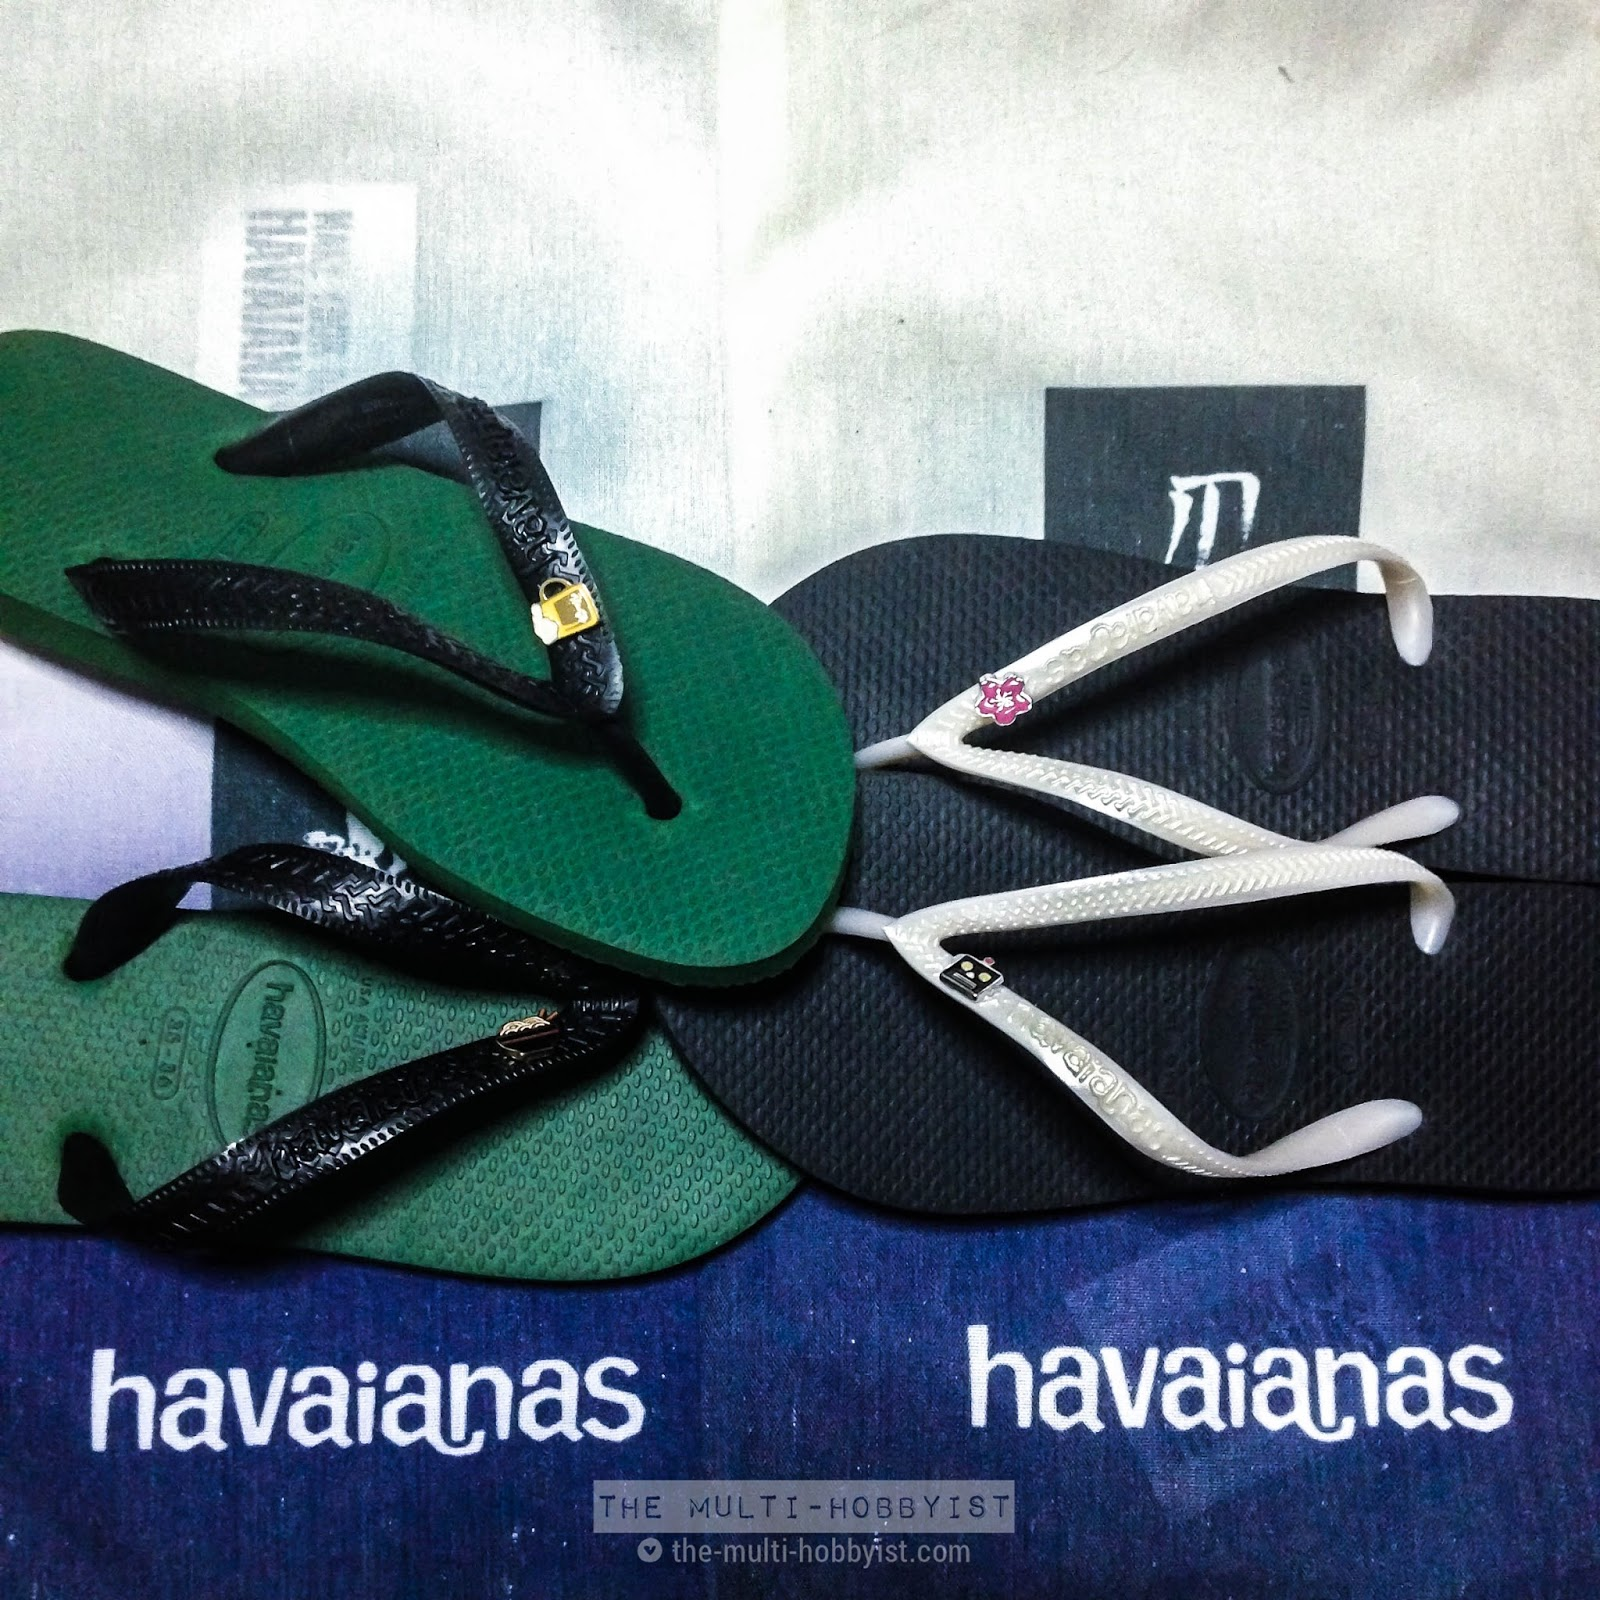 182494d44126 My Make-Your-Own-Havaianas (MYOH) 2016 experience - The Multi-Hobbyist